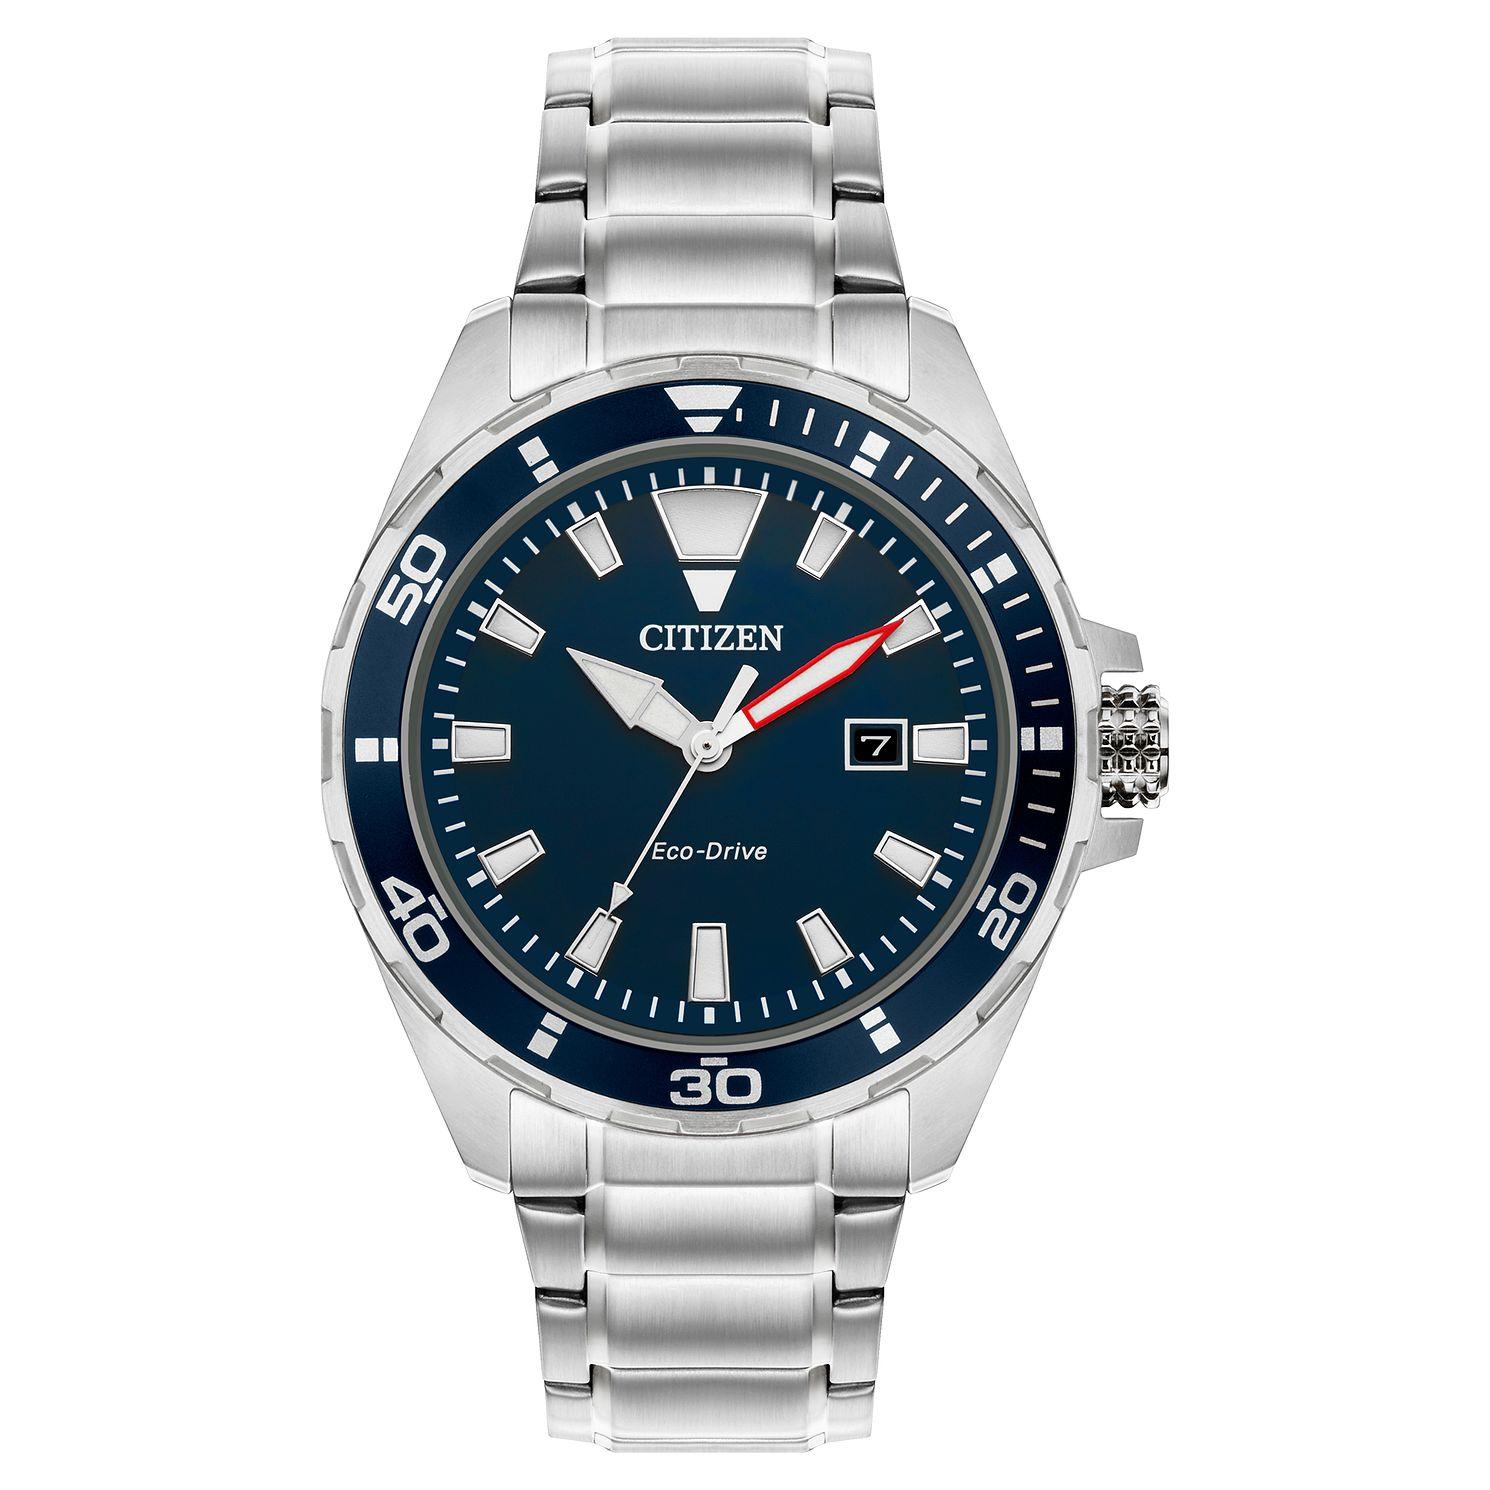 Citizen Eco-Drive Men's Stainless Steel Bracelet Watch BM7450-81M - £73.99 @ H Samuel